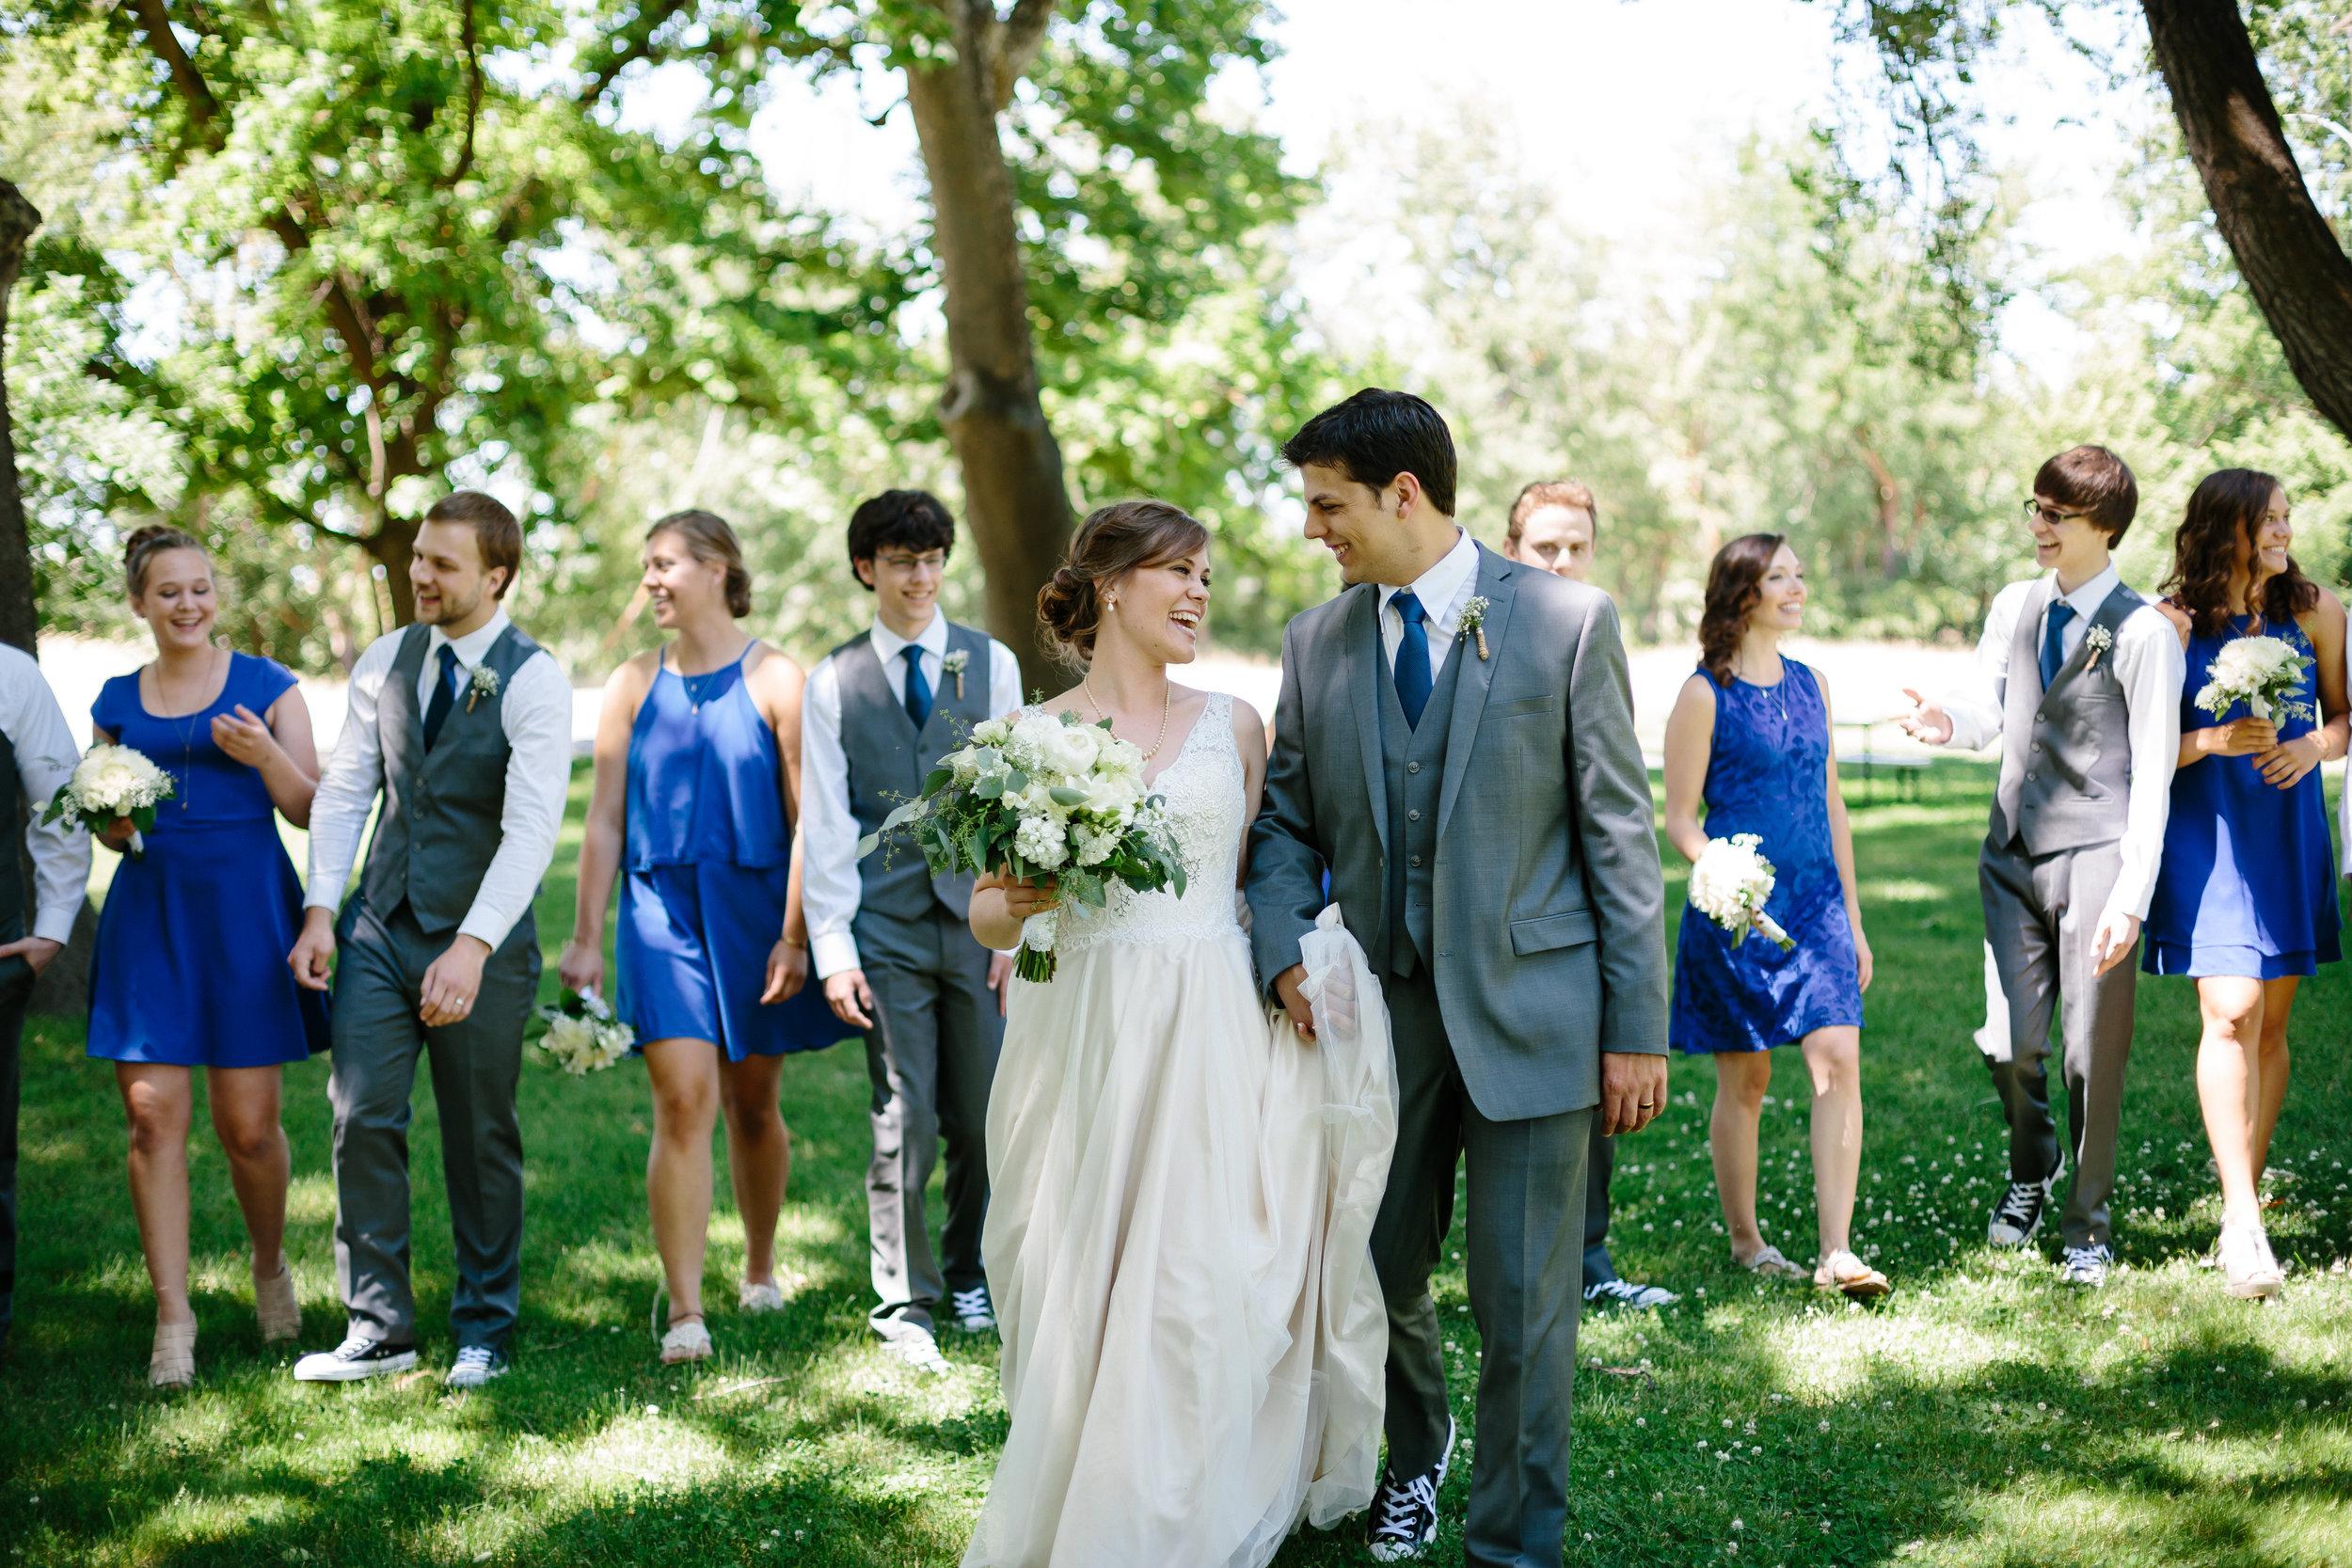 Jordan & Shantel Married - Idaho - Corrie Mick Photography-147.jpg